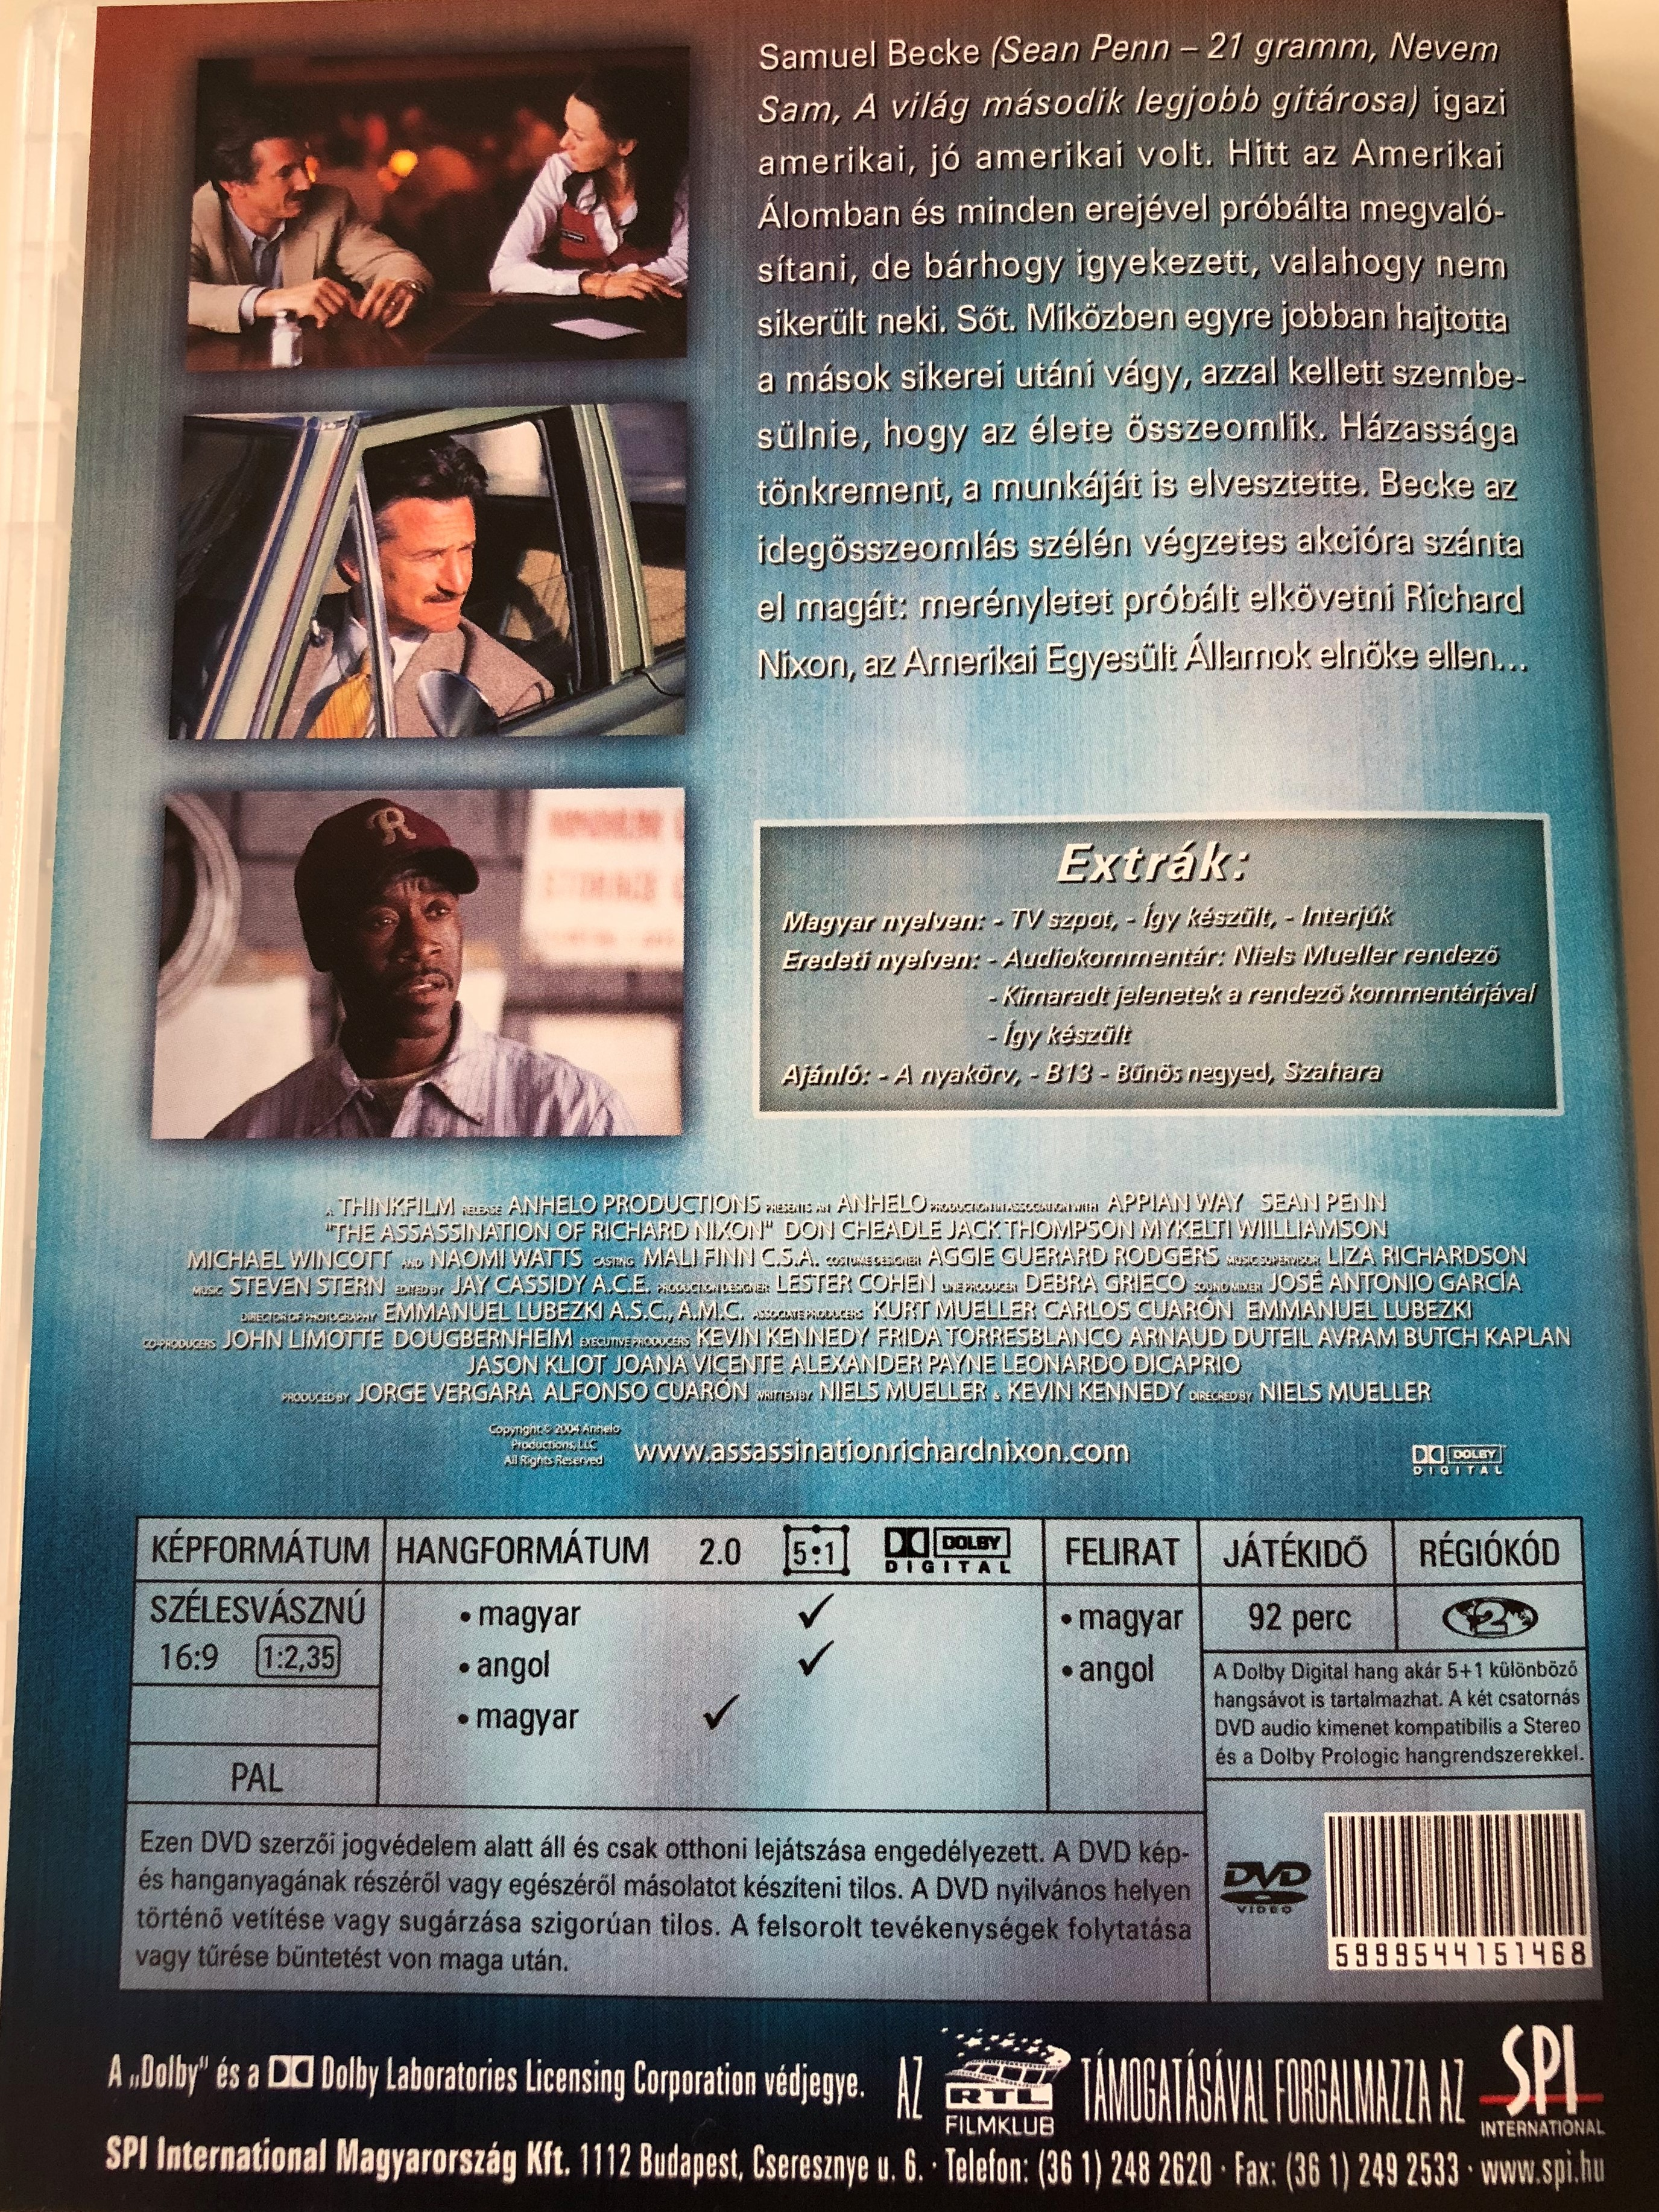 the-assassination-of-richard-nixon-dvd-2004-a-richard-nixon-mer-nylet-directed-by-niels-mueller-starring-sean-penn-don-cheadle-jack-thompson-naomi-watts-brad-william-henke-michael-wincott-mykelti-williamson-.jpg